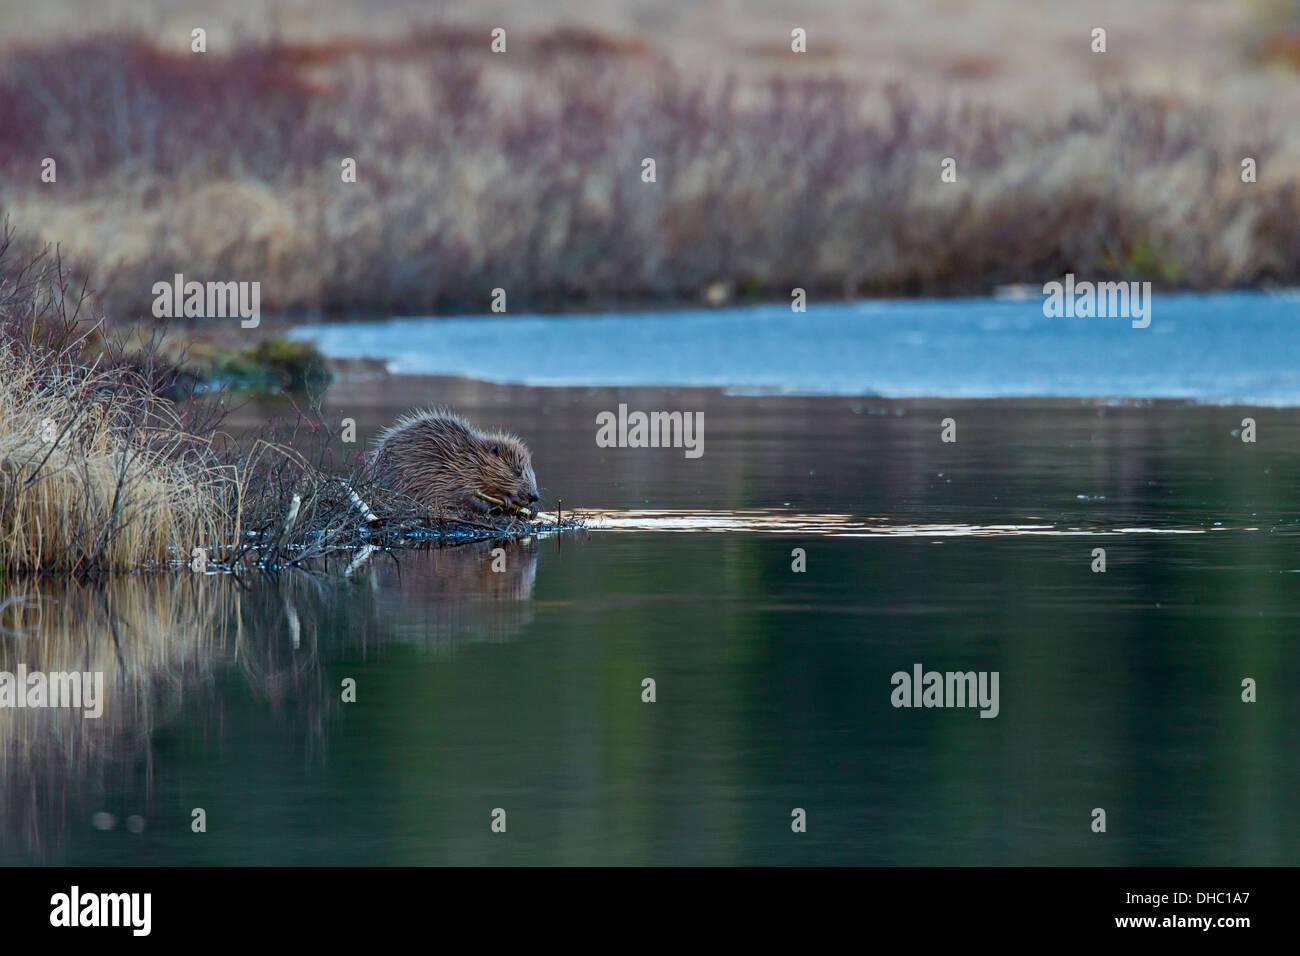 Eurasian beaver / European beaver (Castor fiber) sitting on lake shore while gnawing on twig, Sweden, Scandinavia Stock Photo